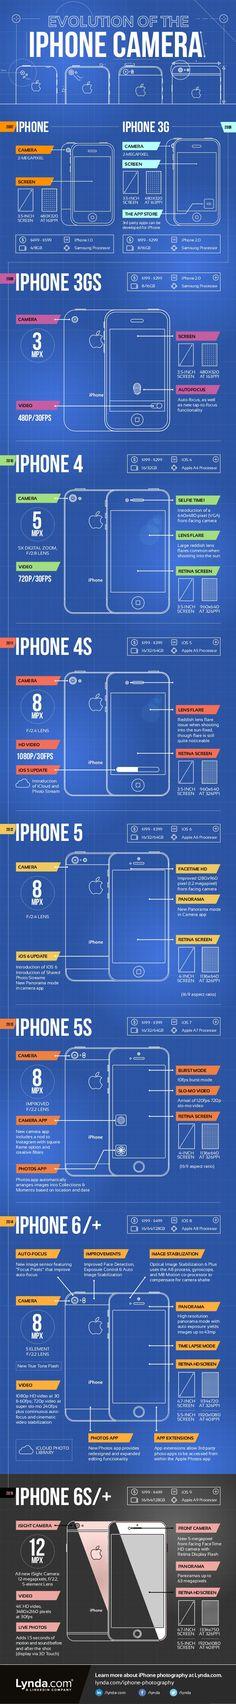 evolucion-camara-iphone-infografia.jpg (638×4608)